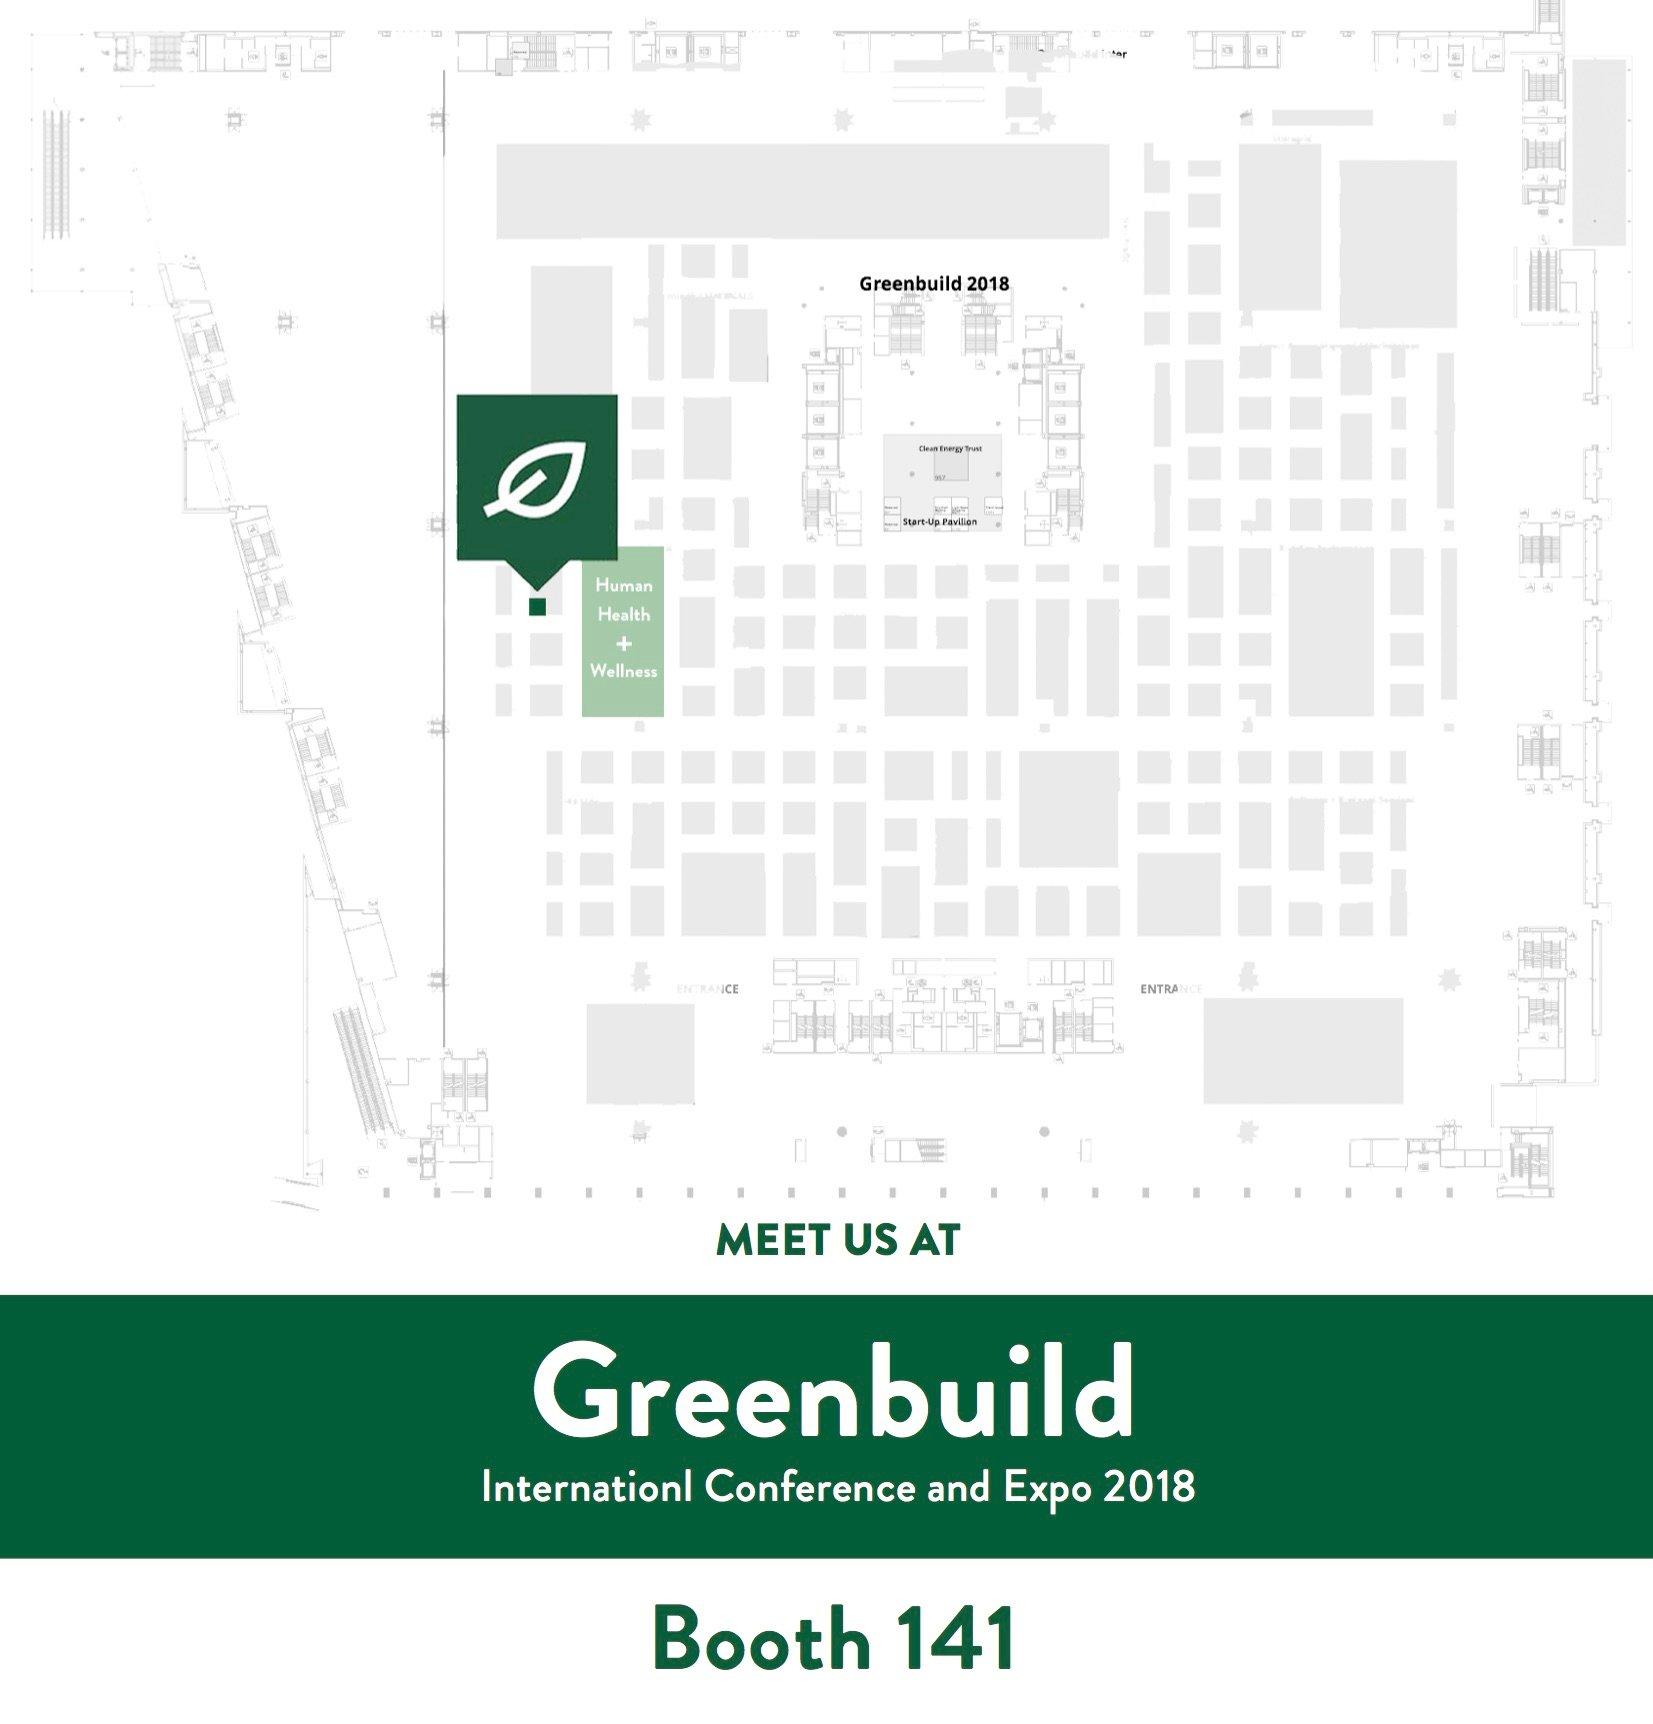 Greenbuild_map_2018